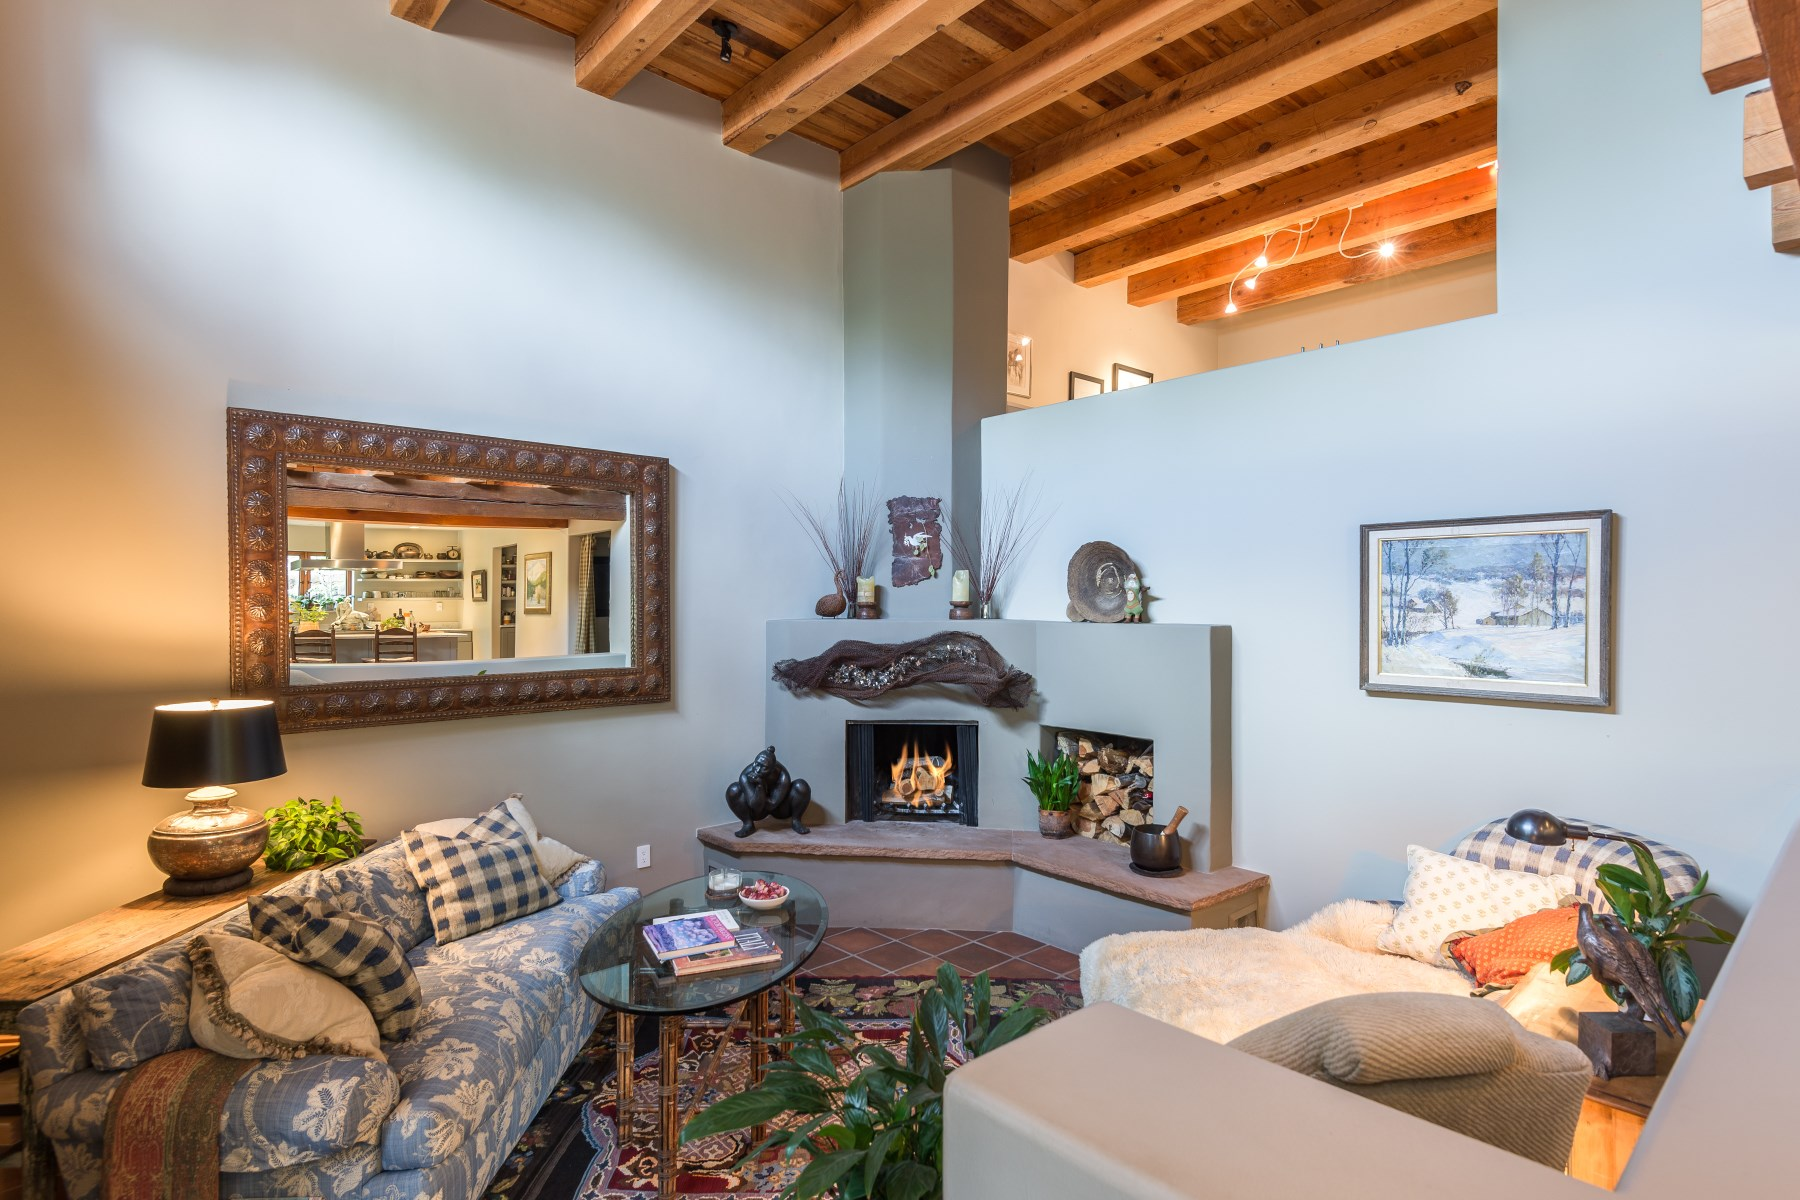 Condominium for Sale at 707 E. Palace Ave #28 Santa Fe, New Mexico, 87501 United States